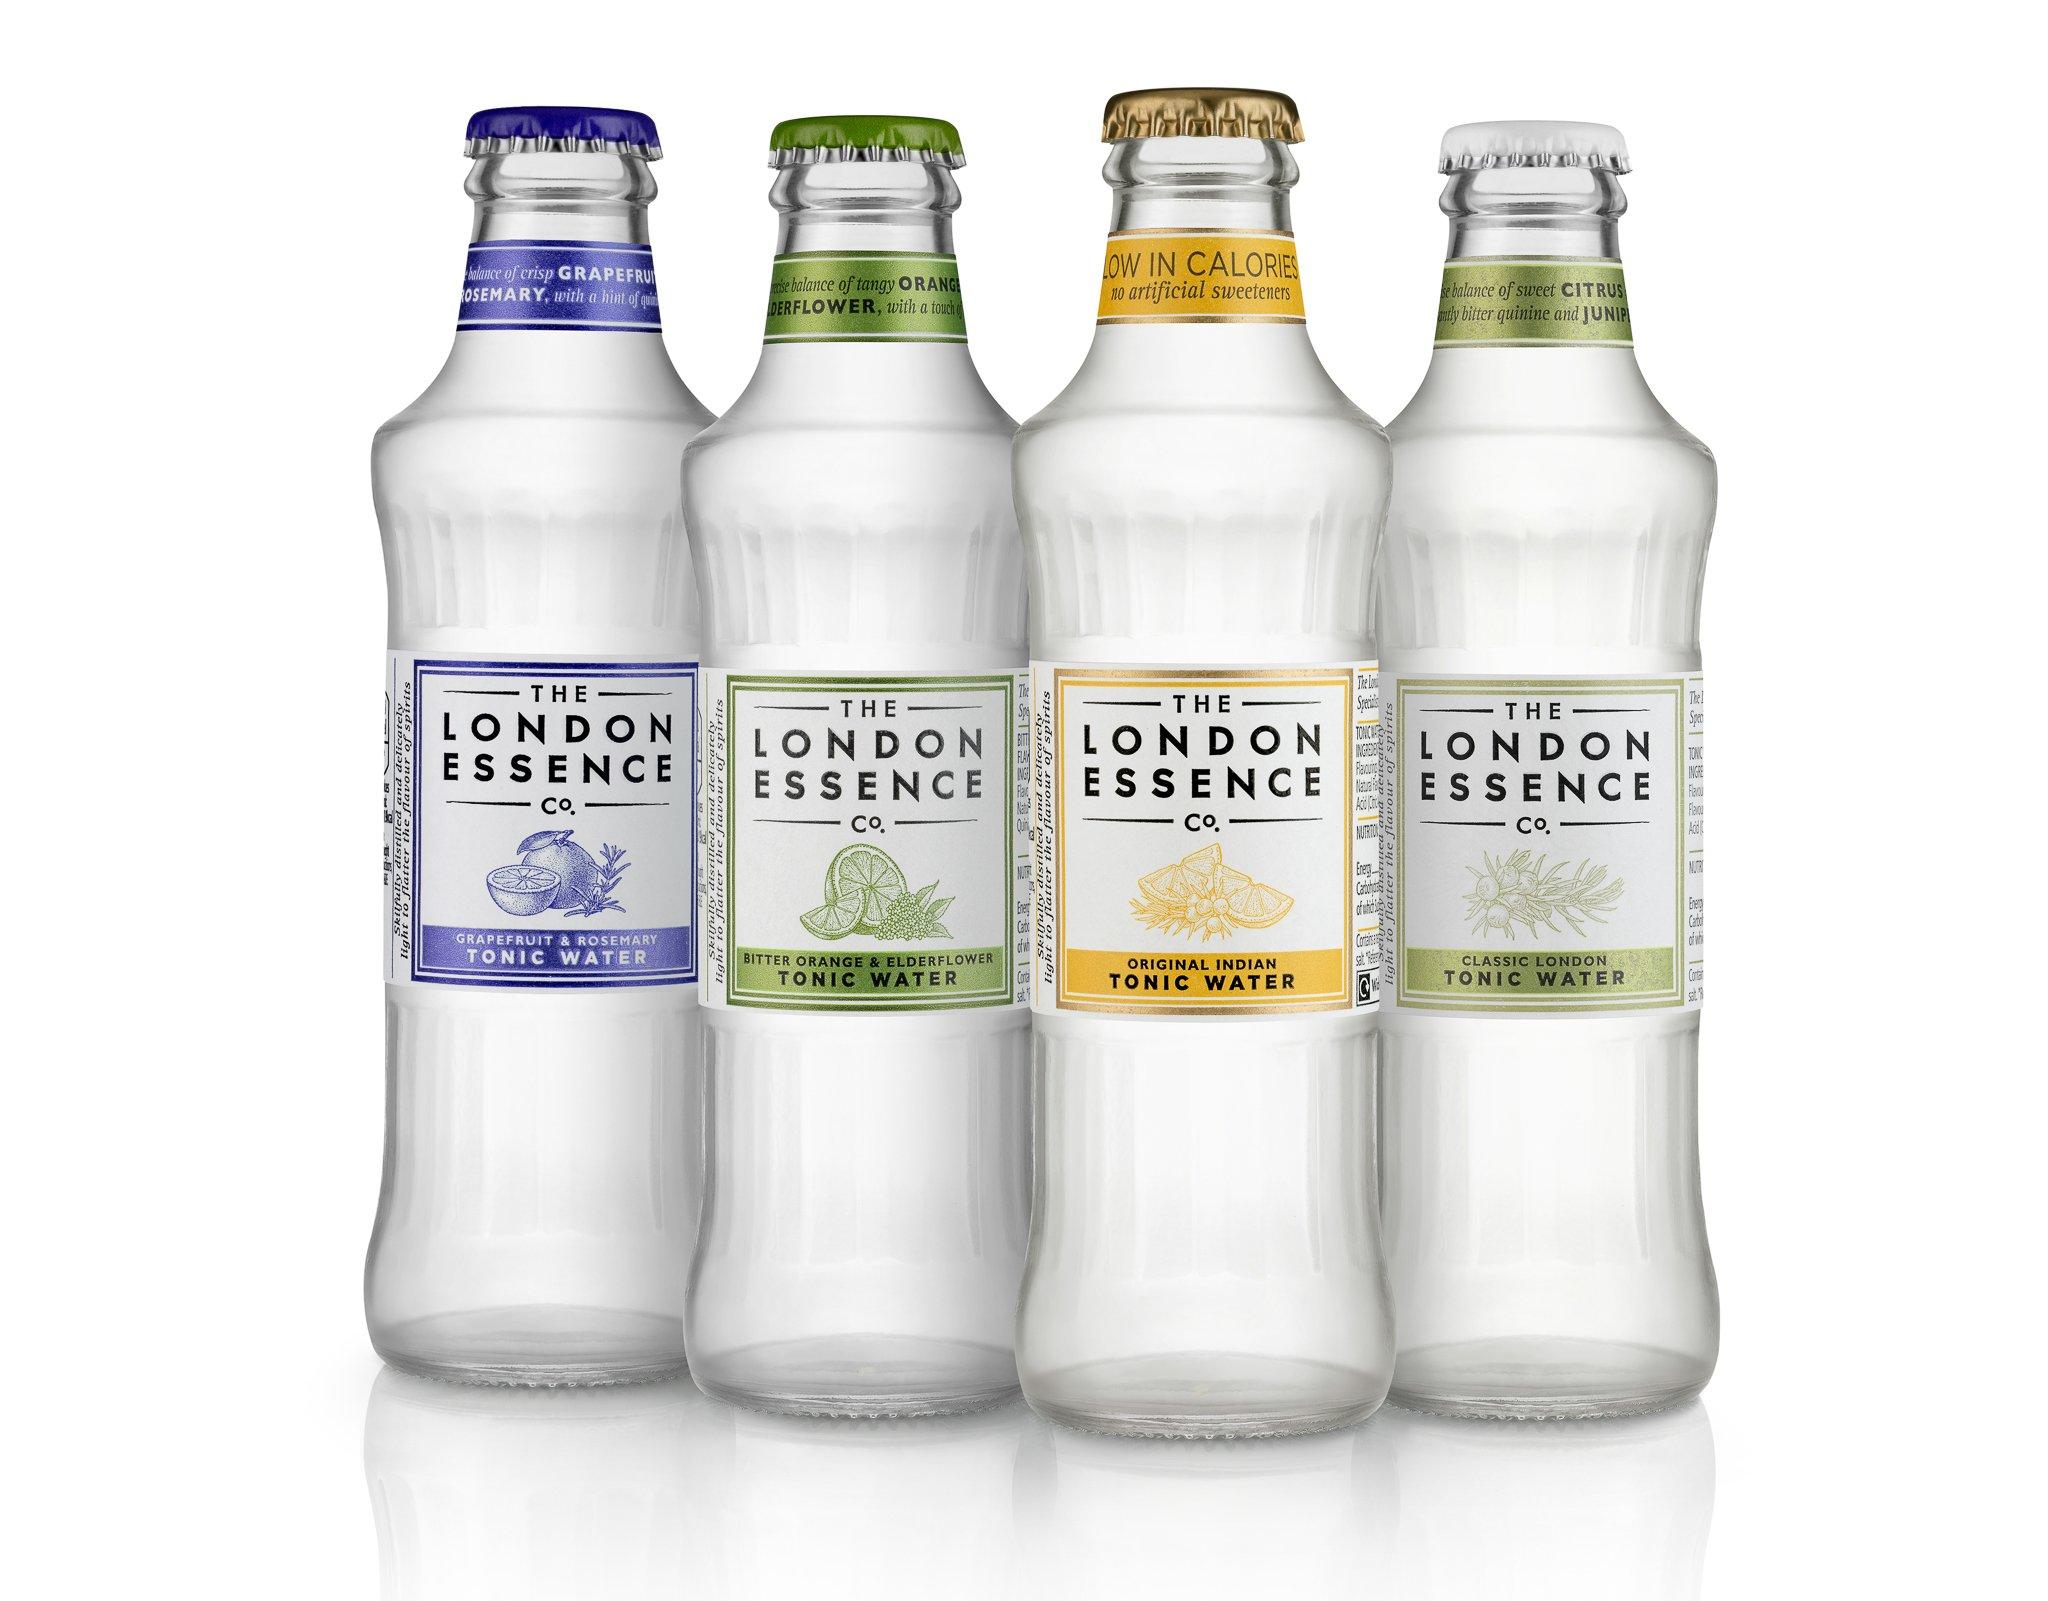 London Essence tonic range, Alles over gin.